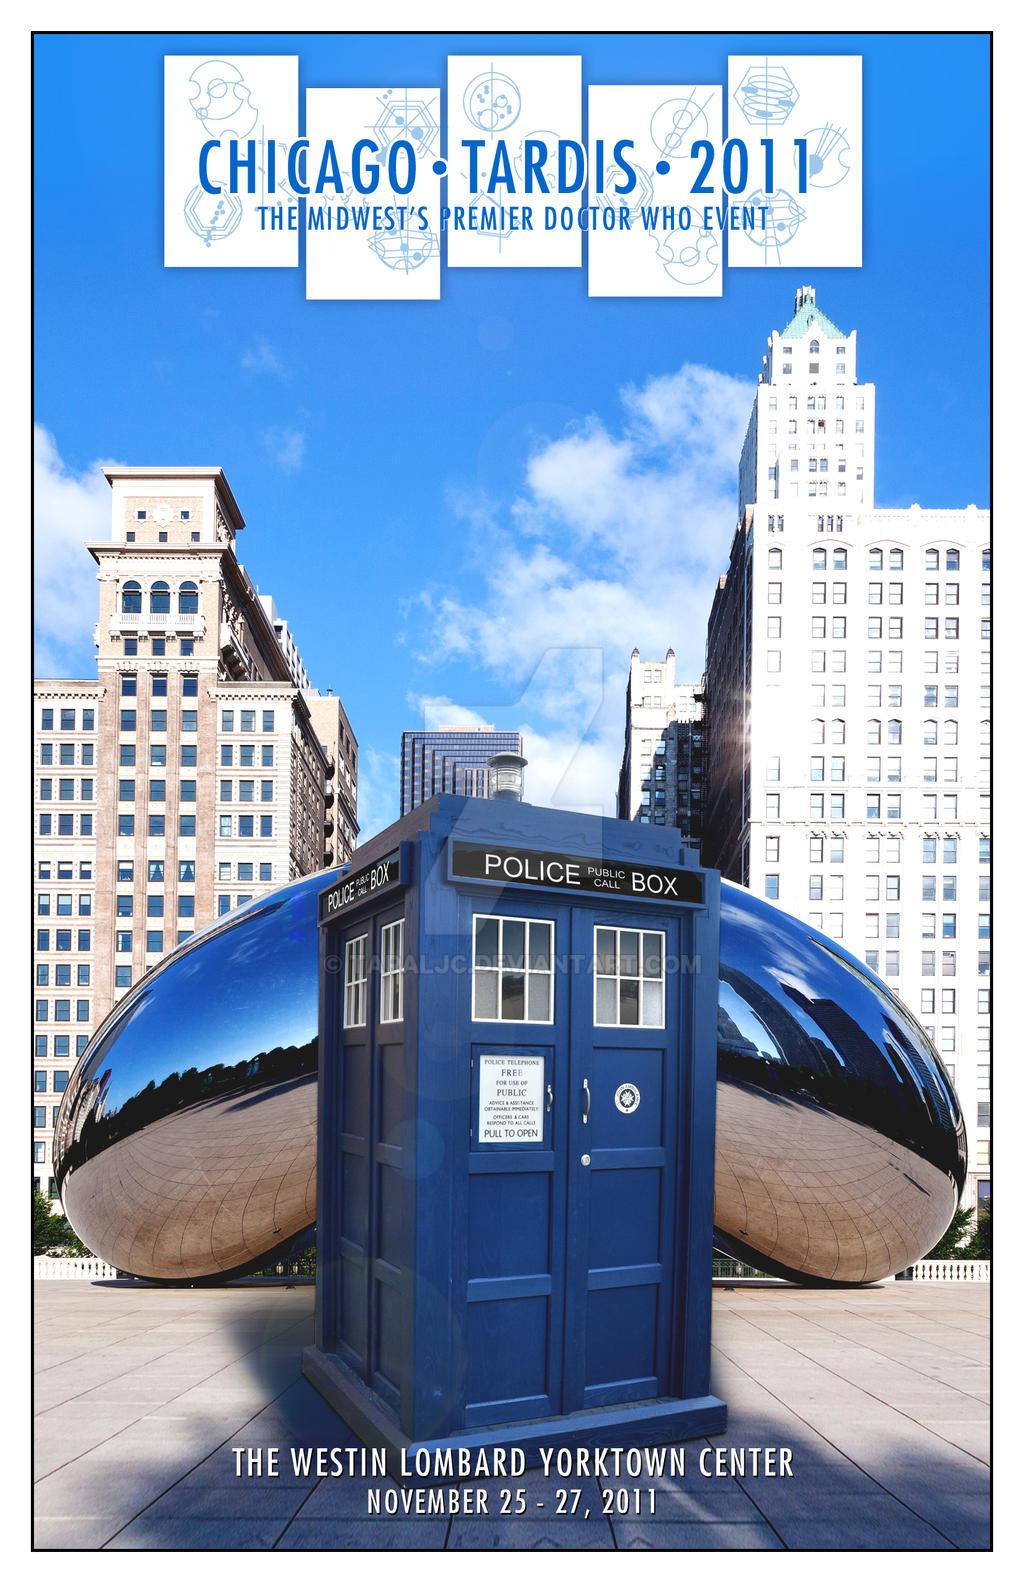 Chicago TARDIS 2011 cover by TaraLJC